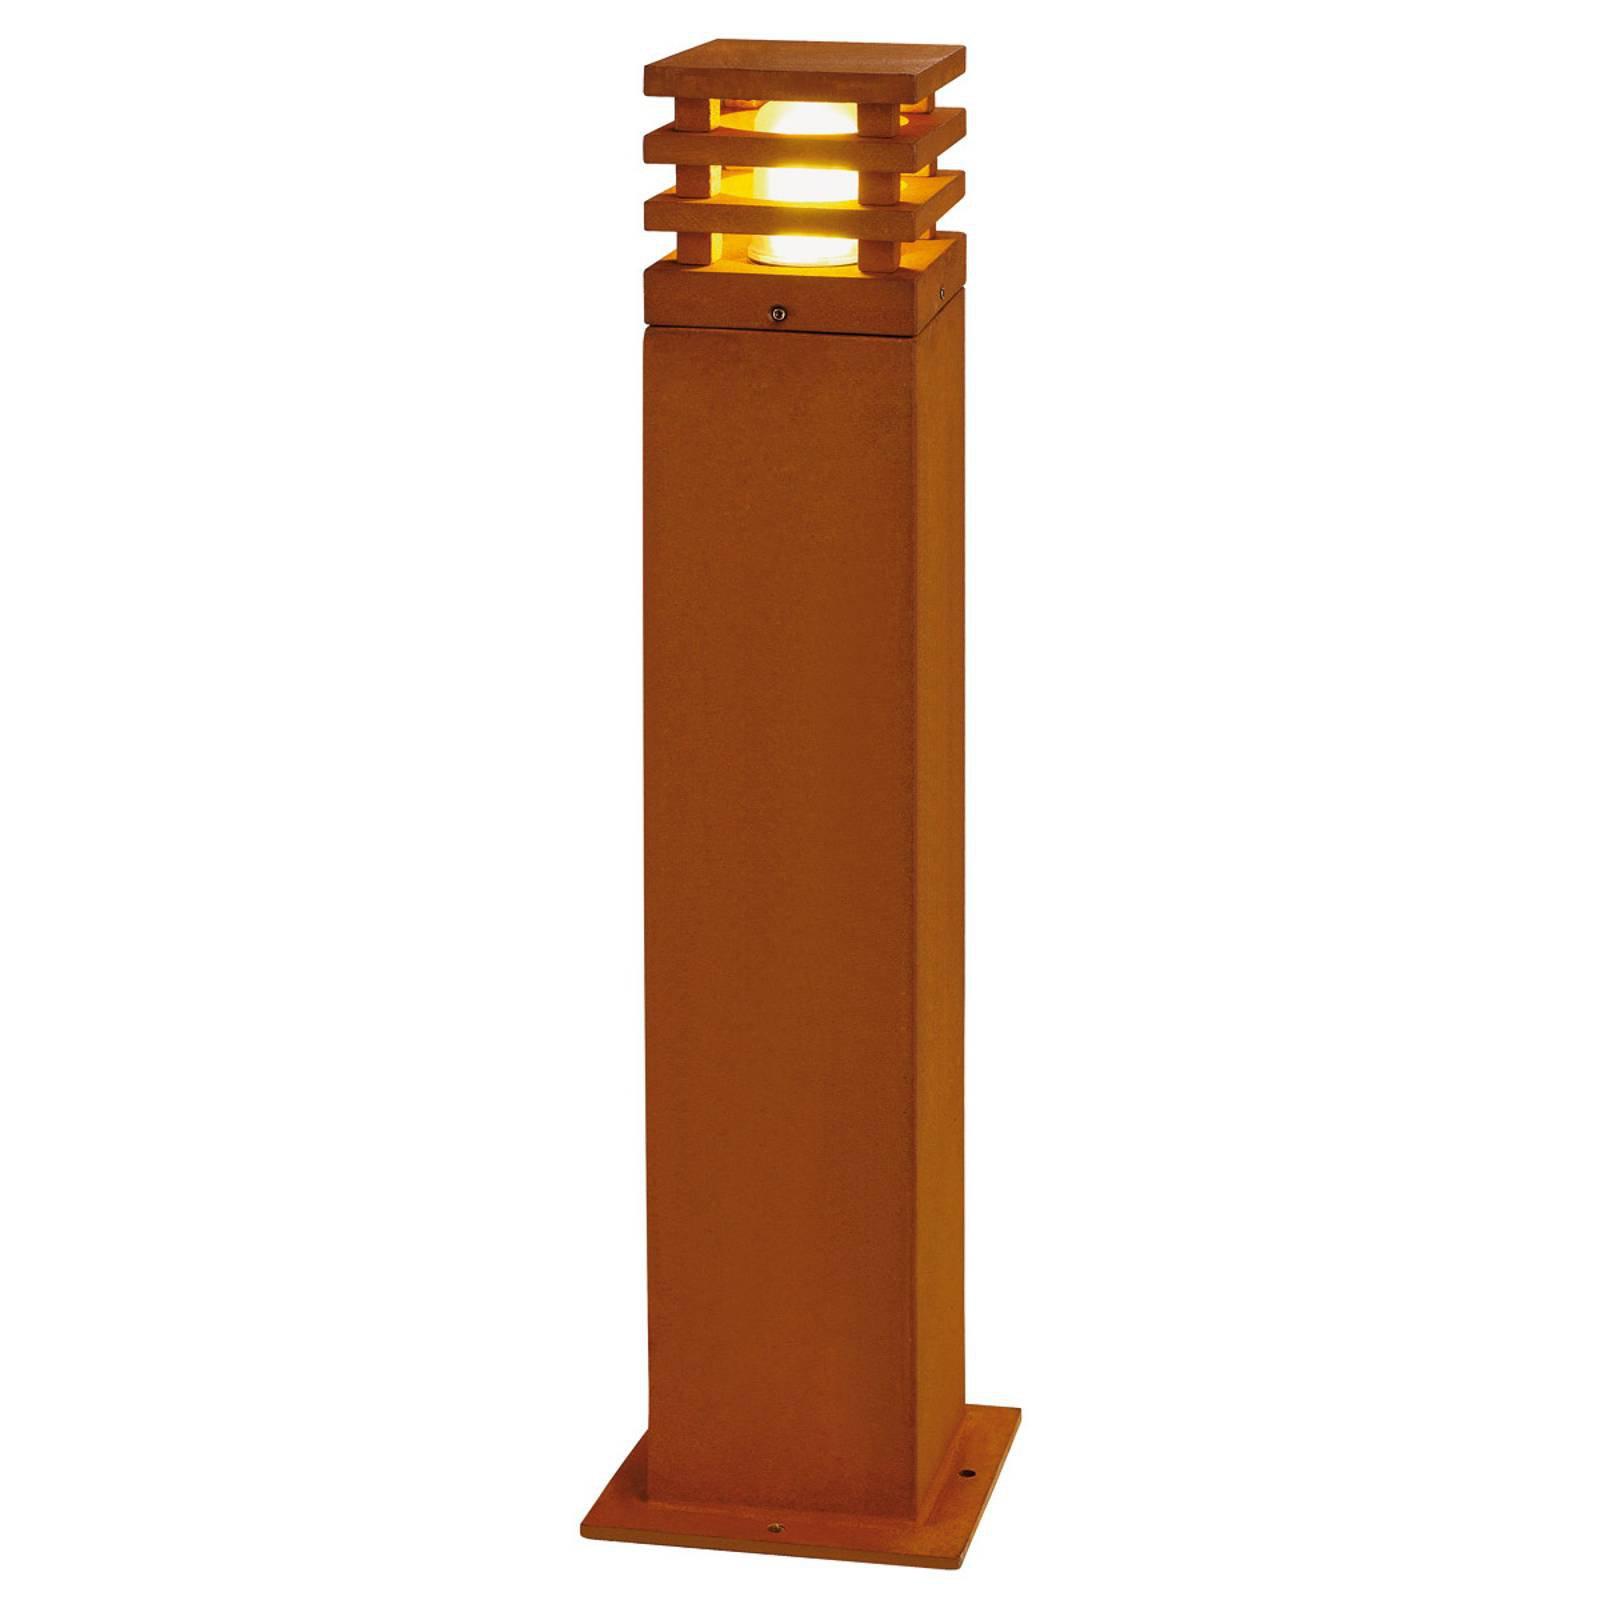 Rustikk LED-gatelampe Rusty, firkantet